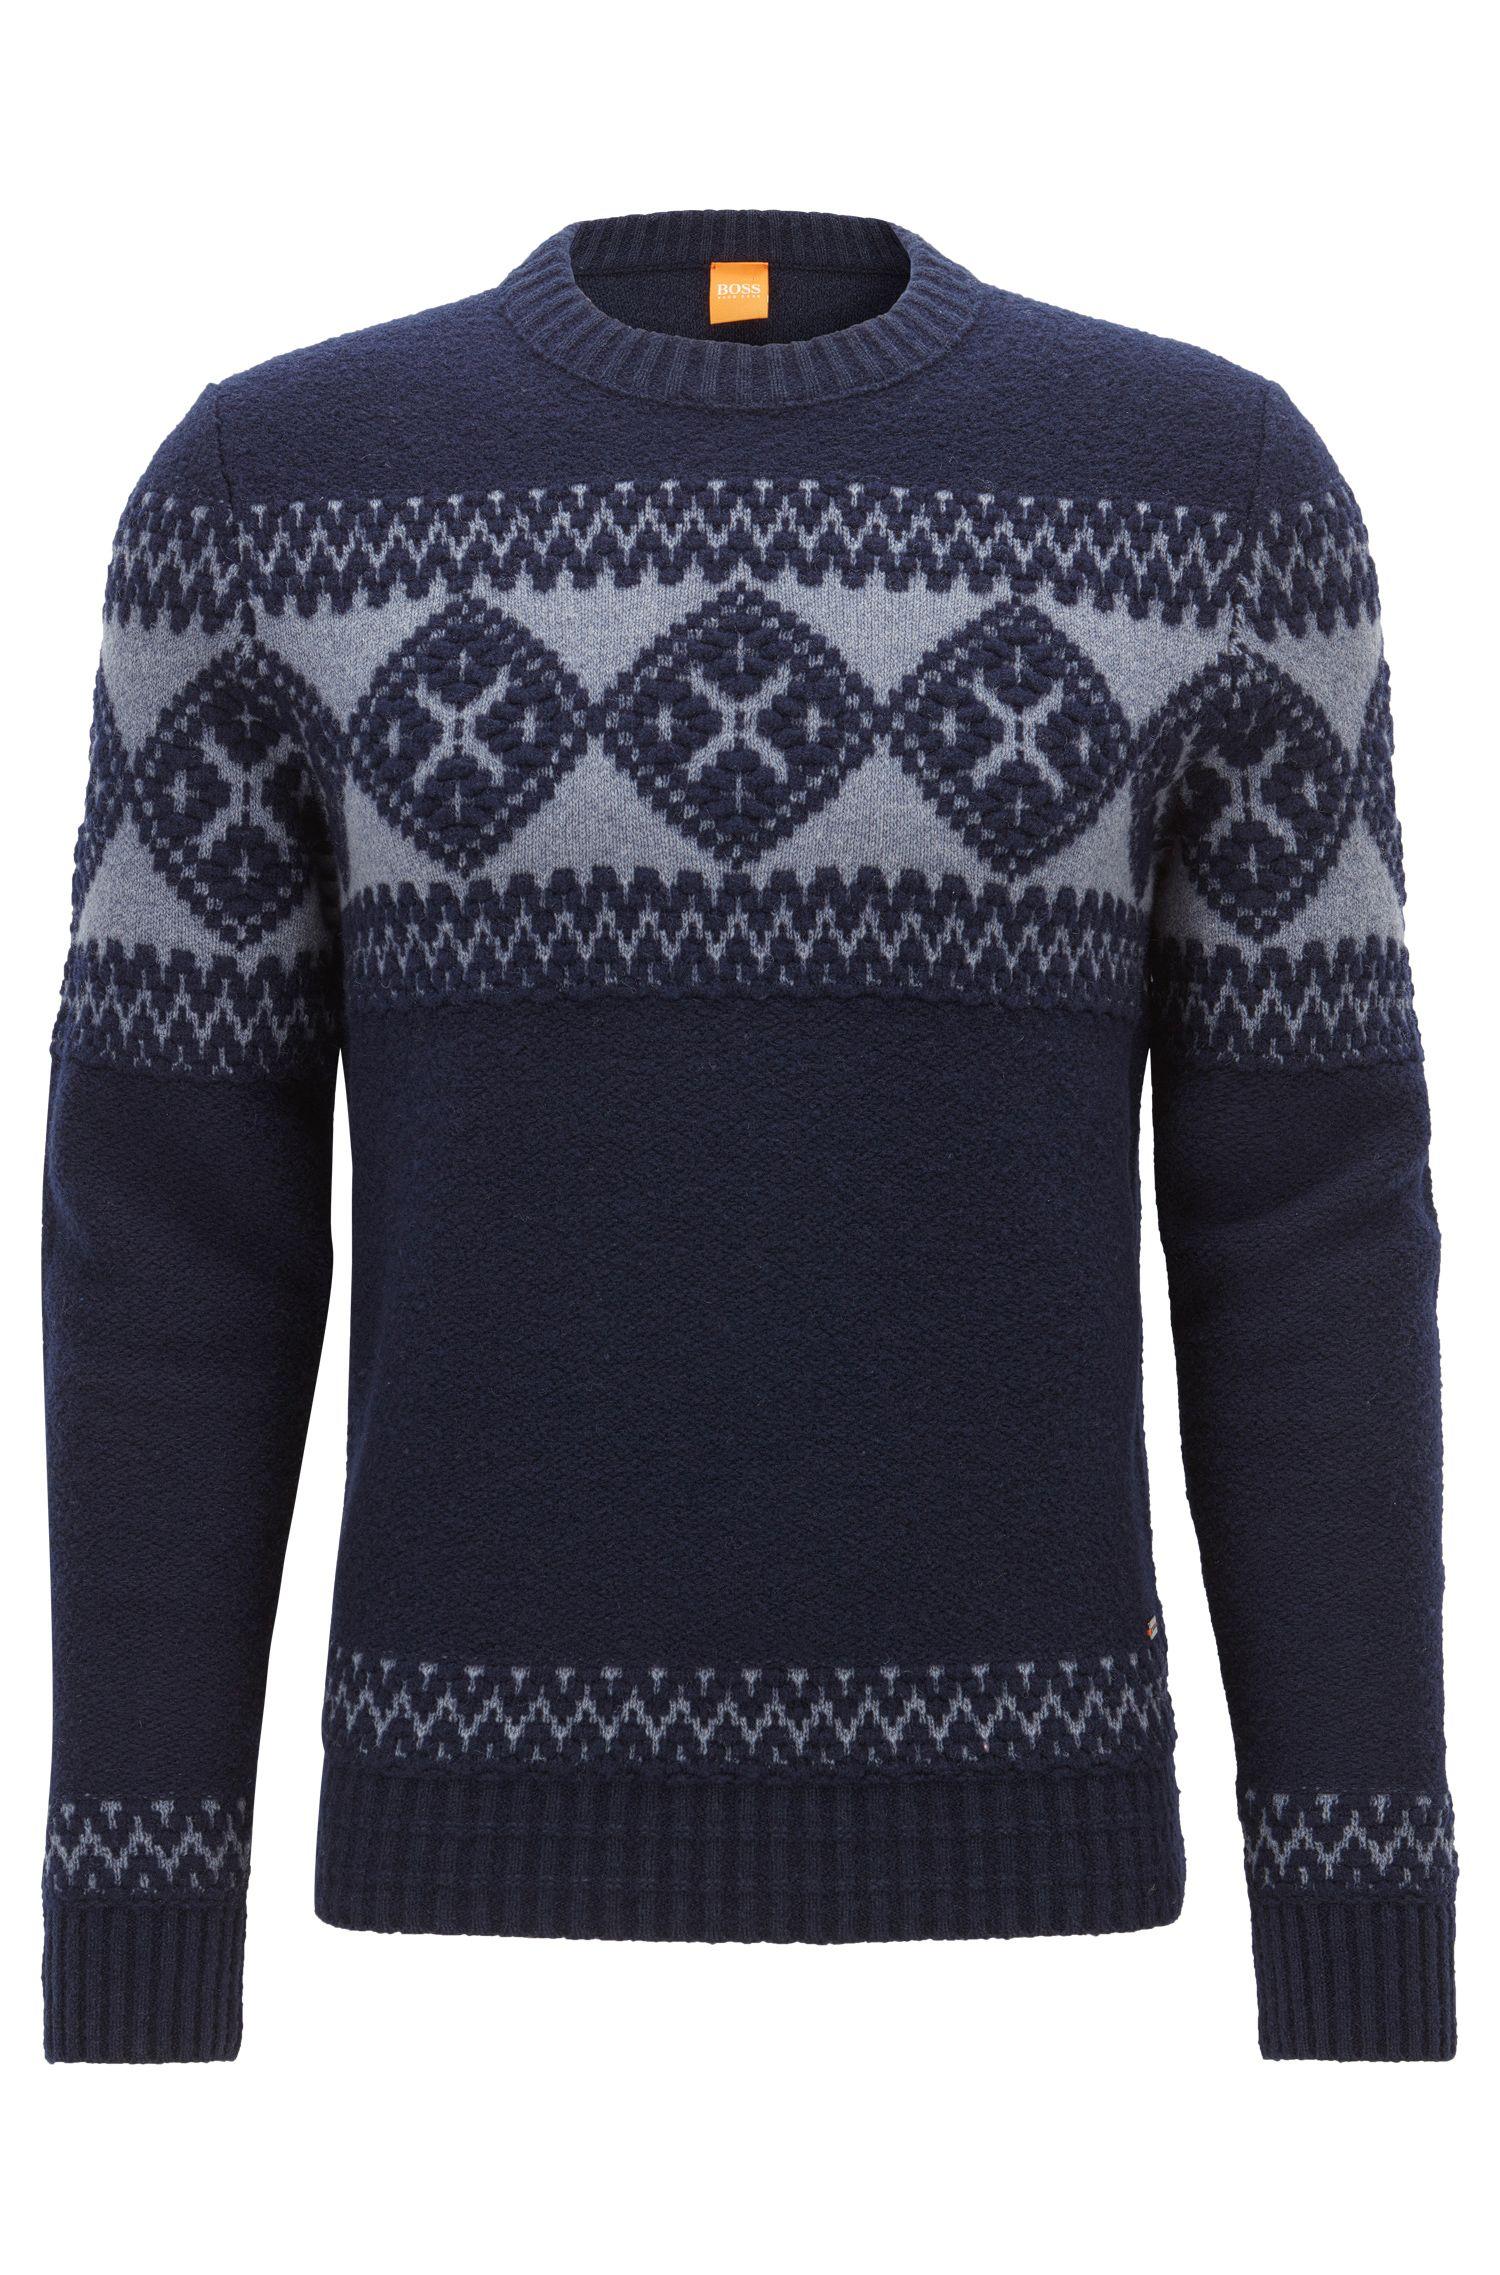 Virgin Wool Blend Fair Isle Sweater   Kionas